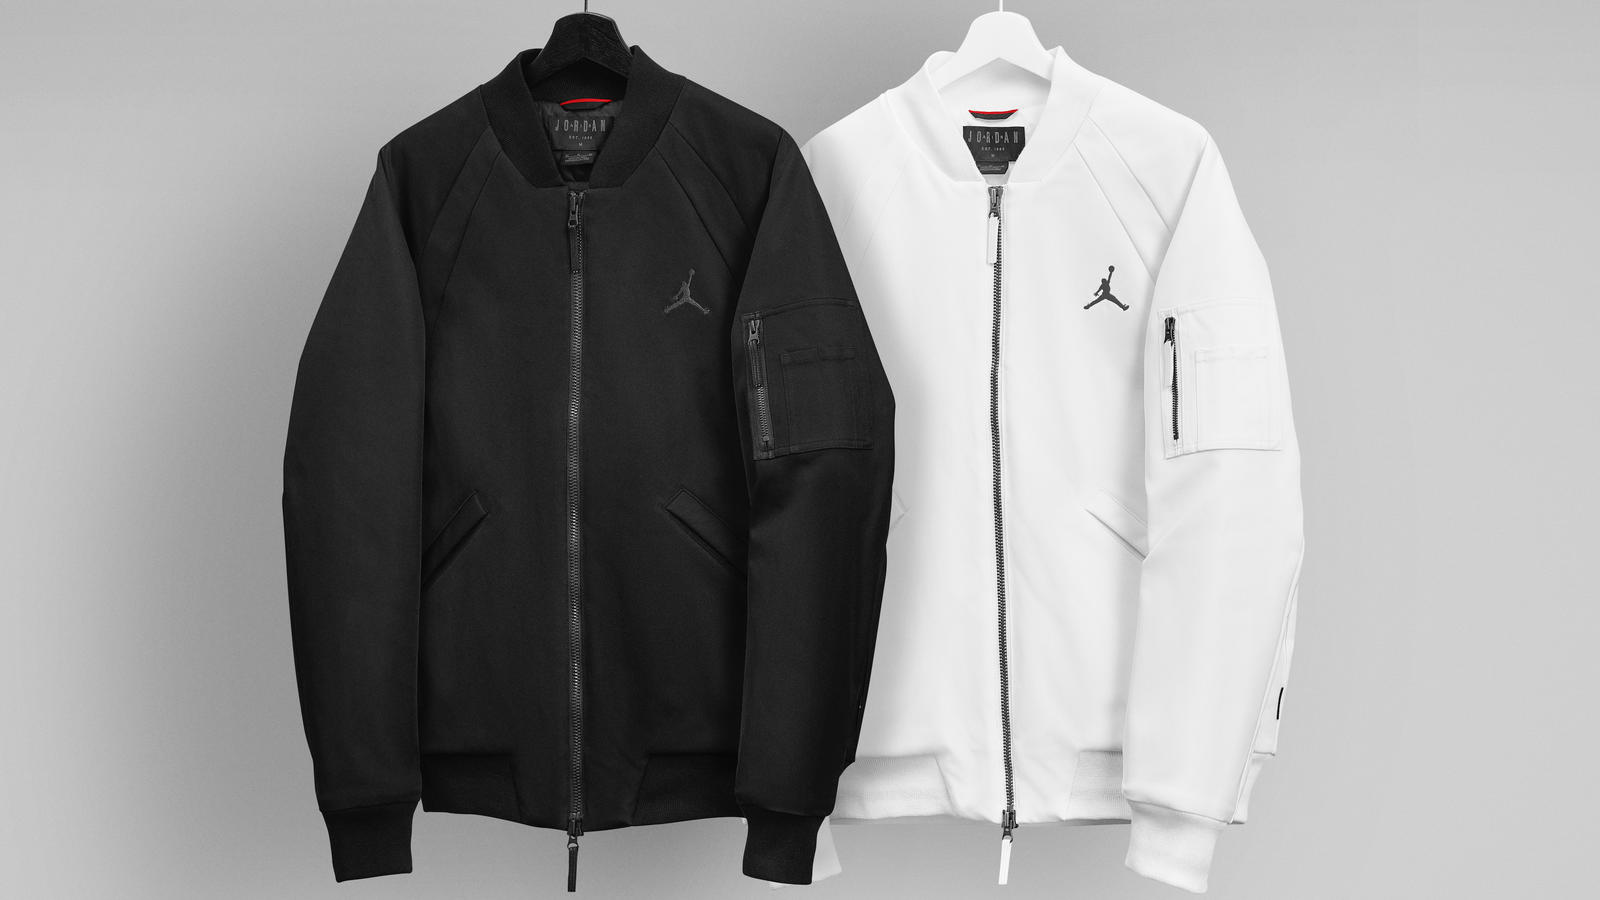 Jordan Brand Unveils Fall '17 Apparel